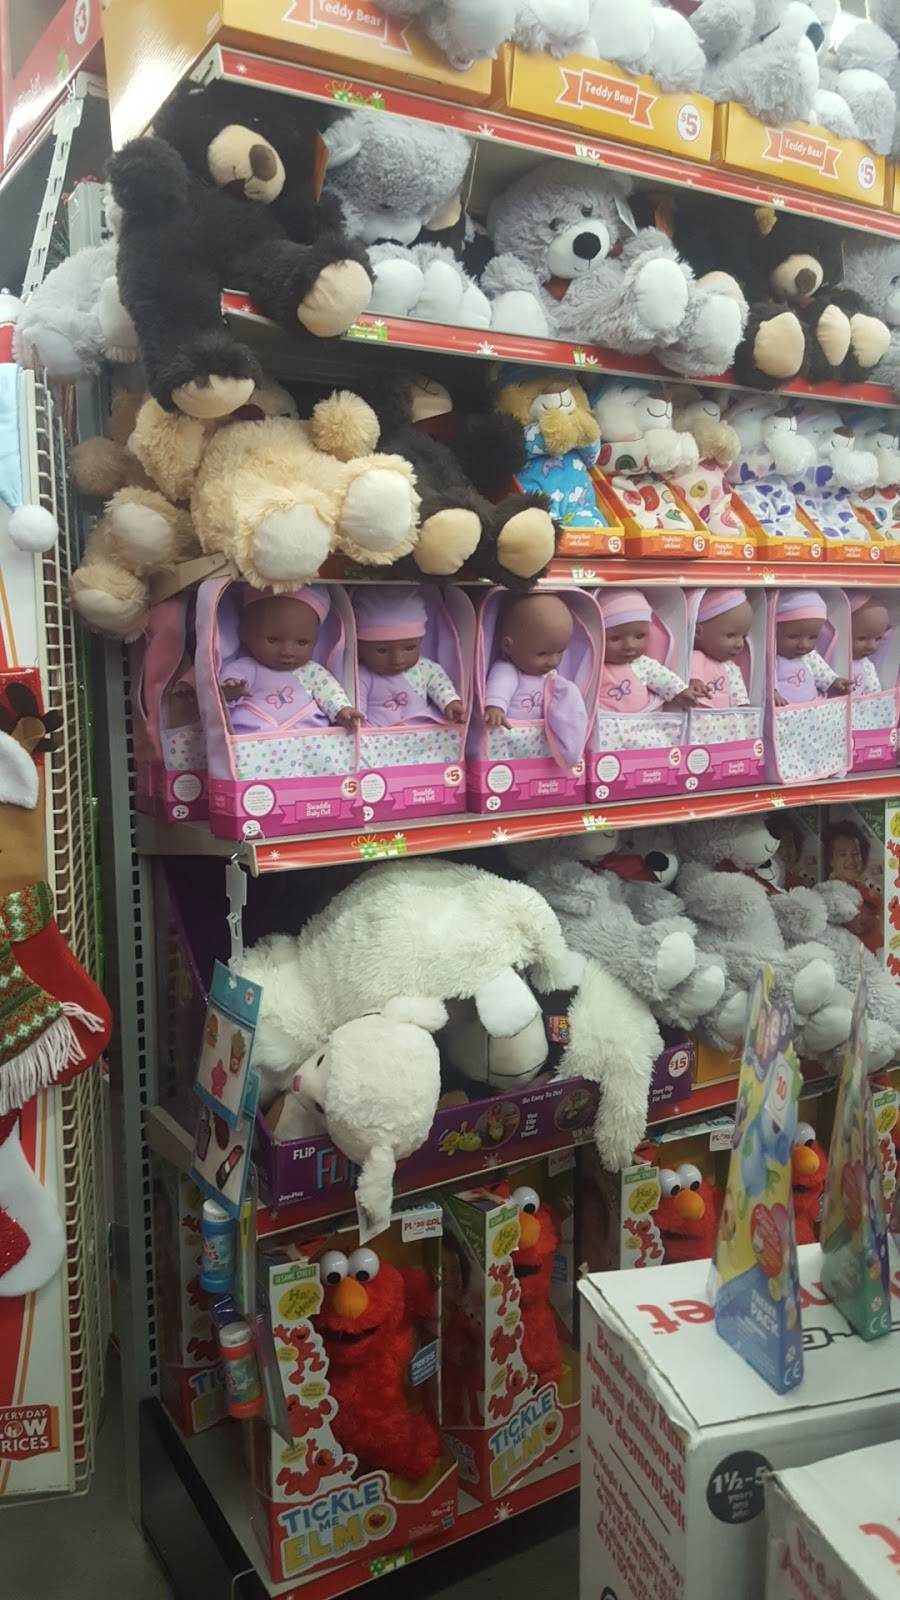 Family Dollar - supermarket  | Photo 2 of 7 | Address: 3333 Palm Ave, Hialeah, FL 33012, USA | Phone: (786) 988-6189